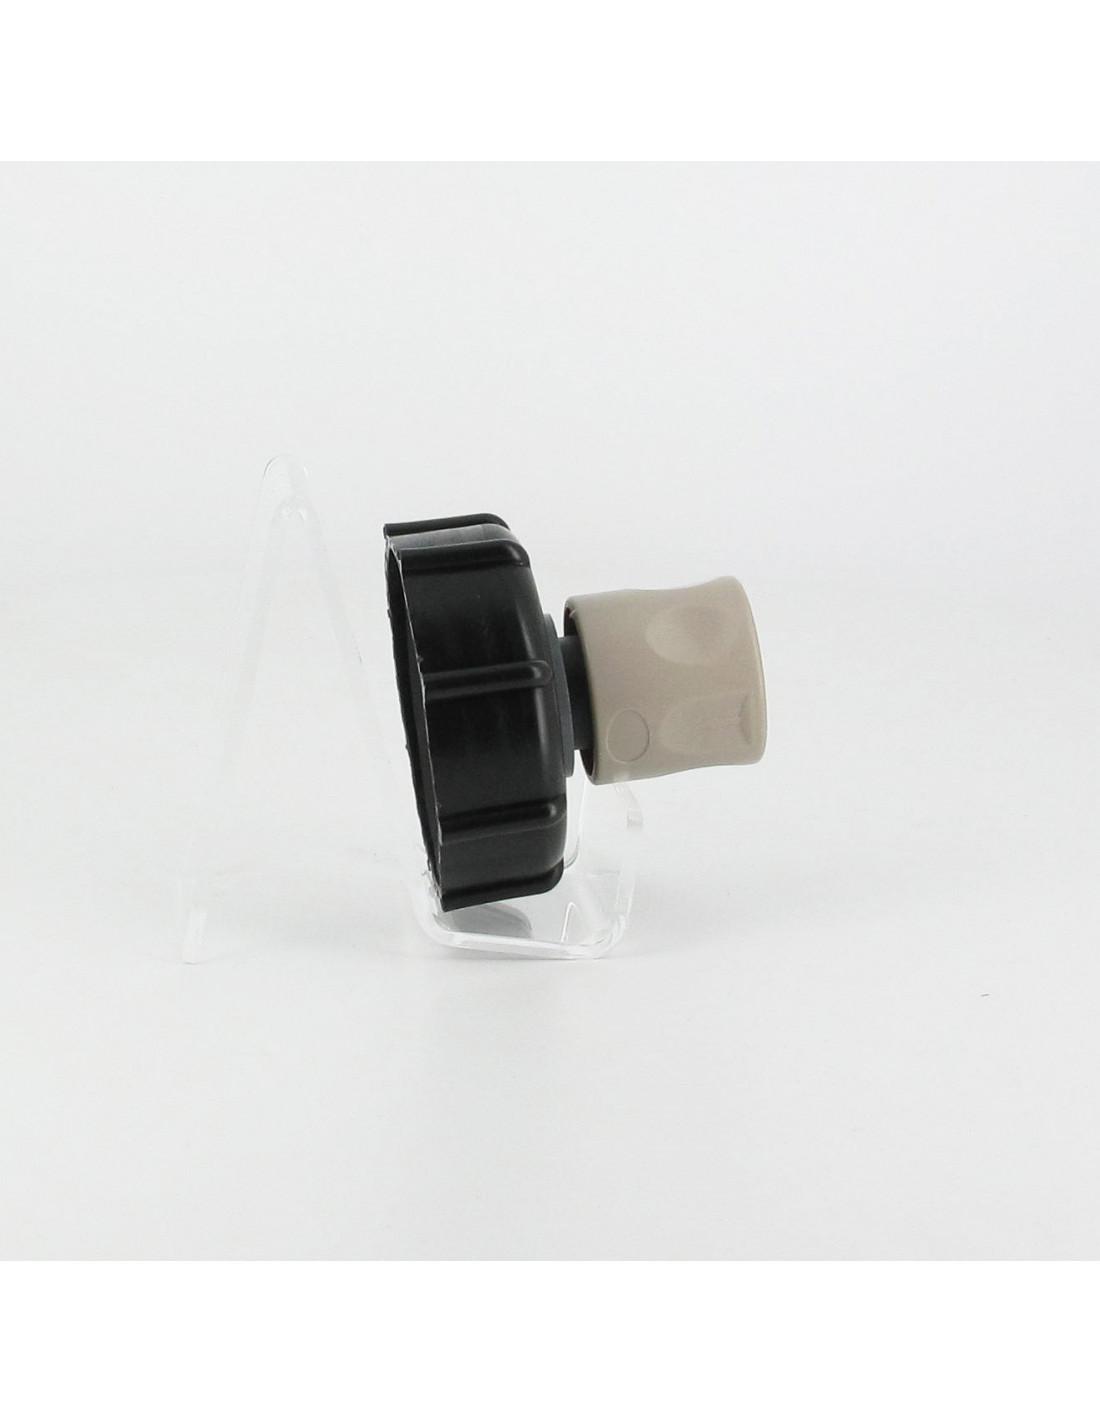 raccord cuve eau s60x6 embout femelle gardena. Black Bedroom Furniture Sets. Home Design Ideas